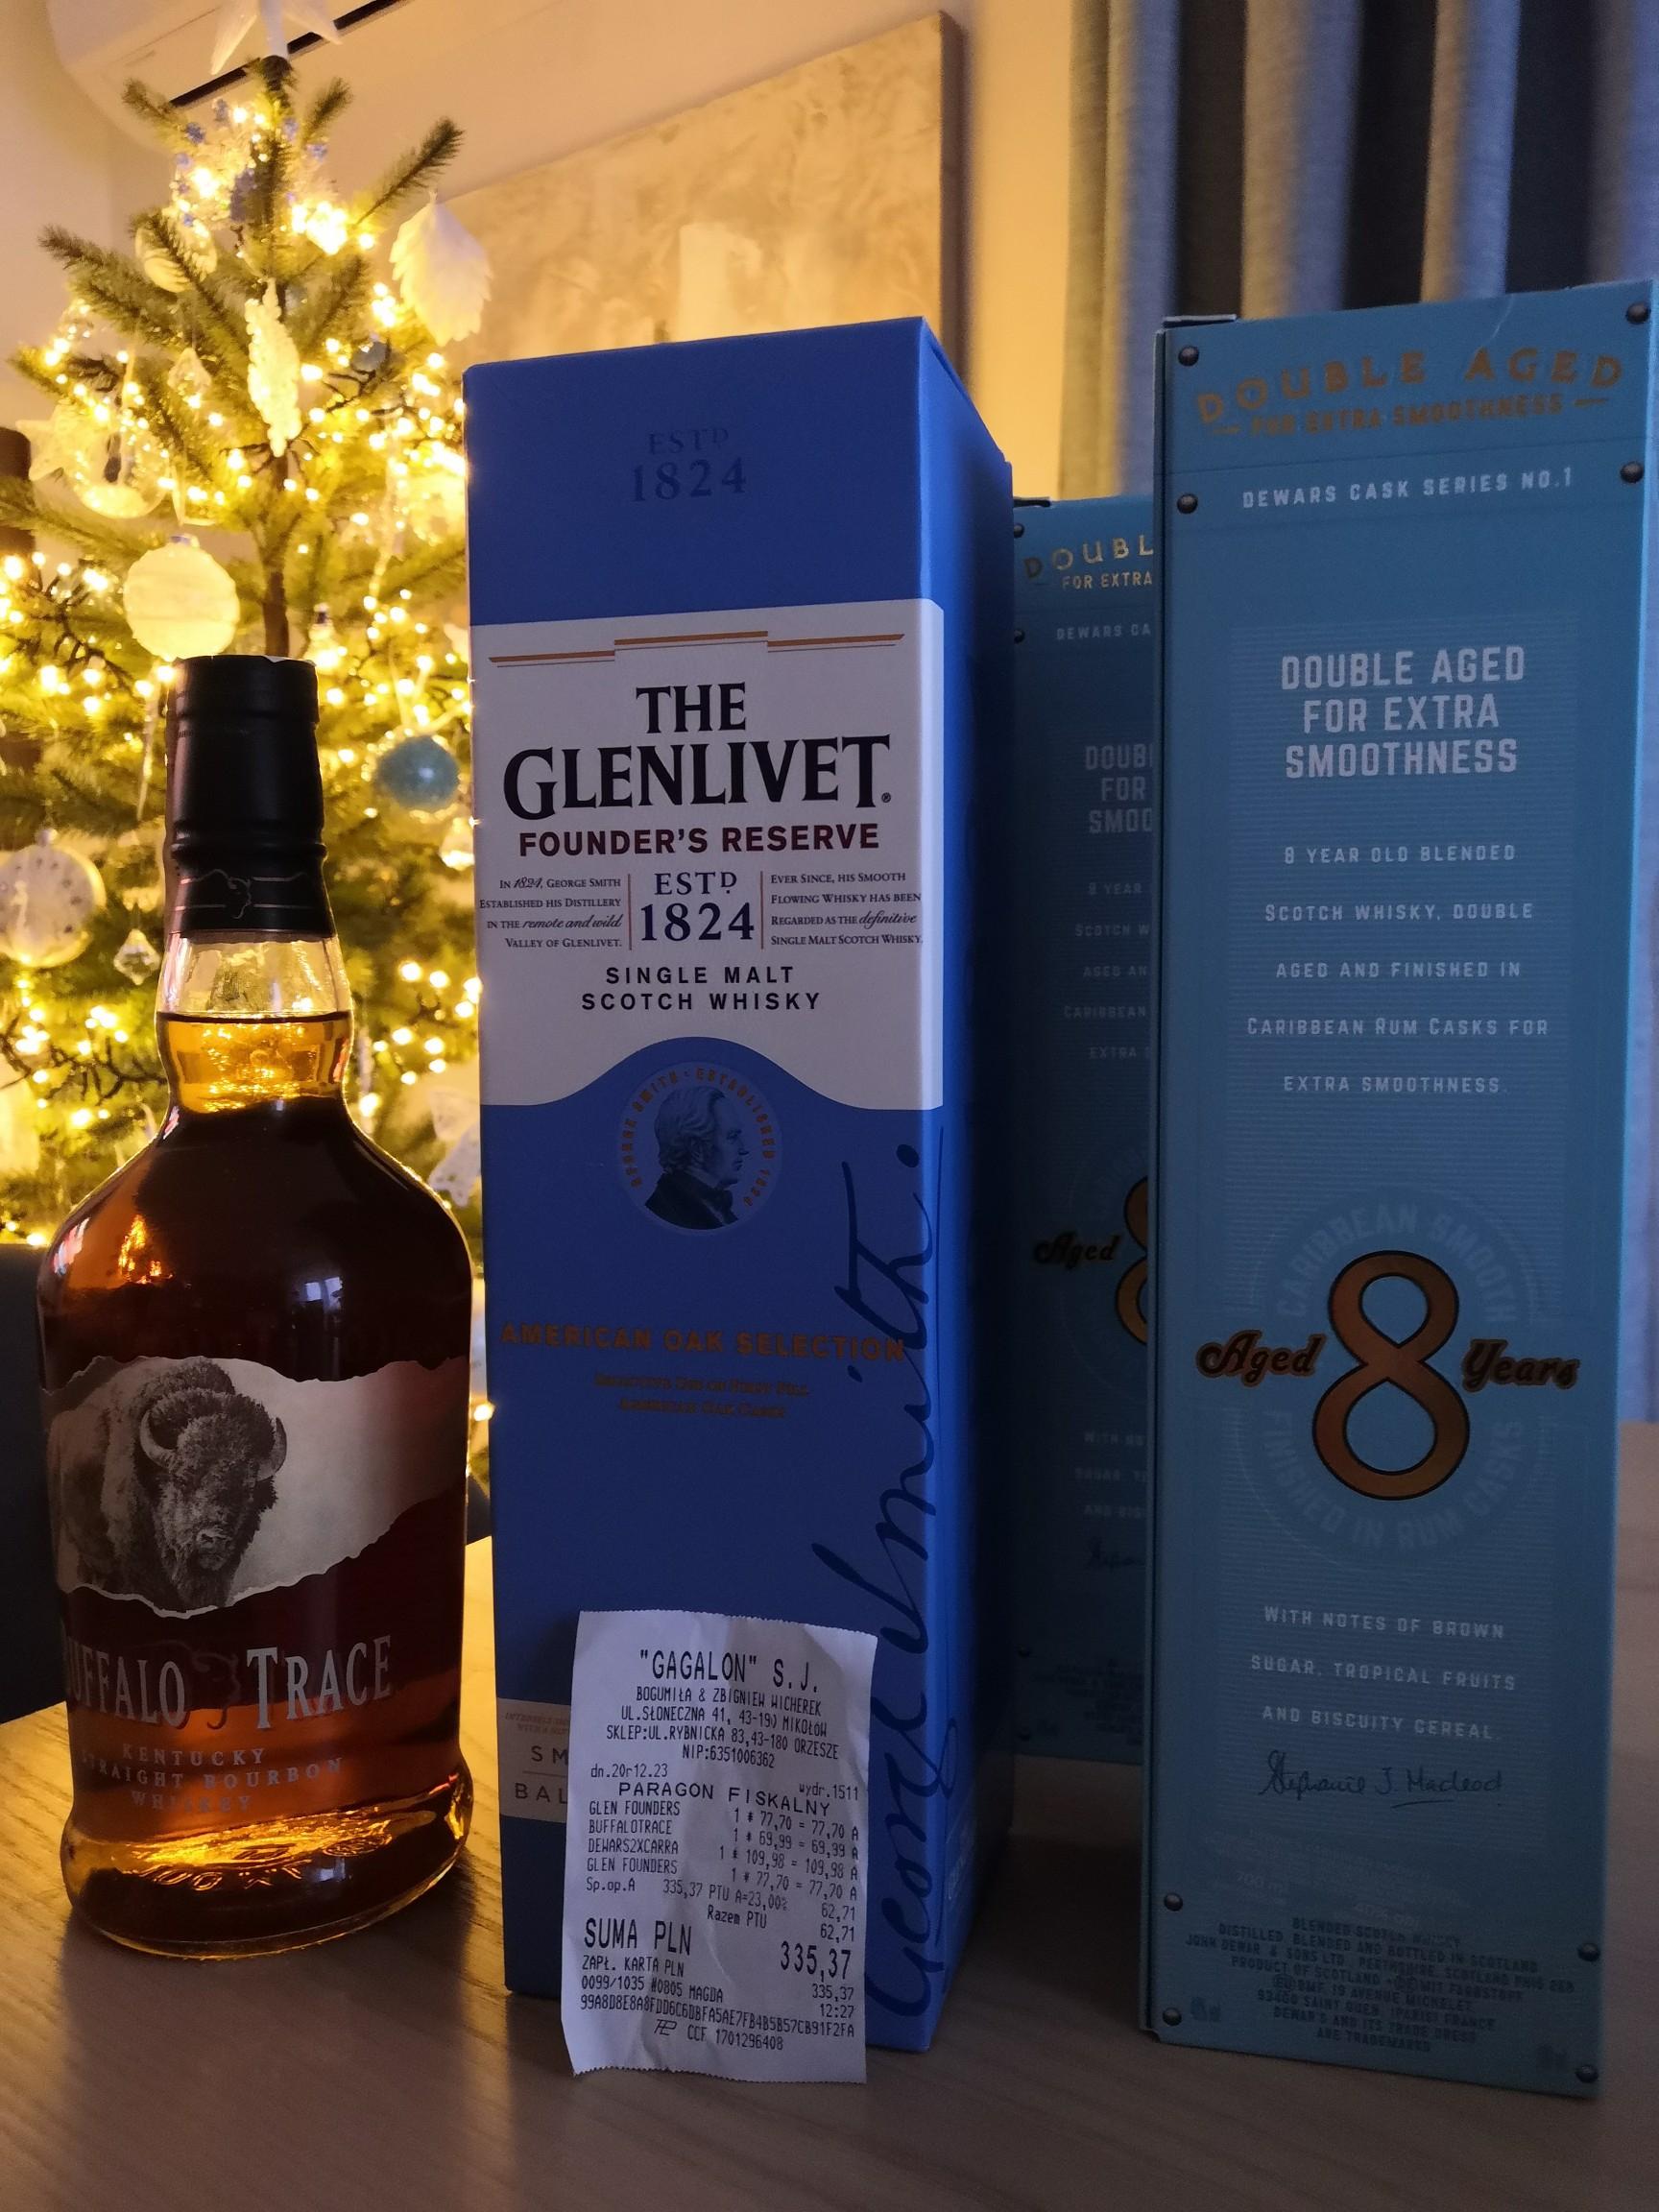 Whisky Glenlivet Founders Reserve single malt